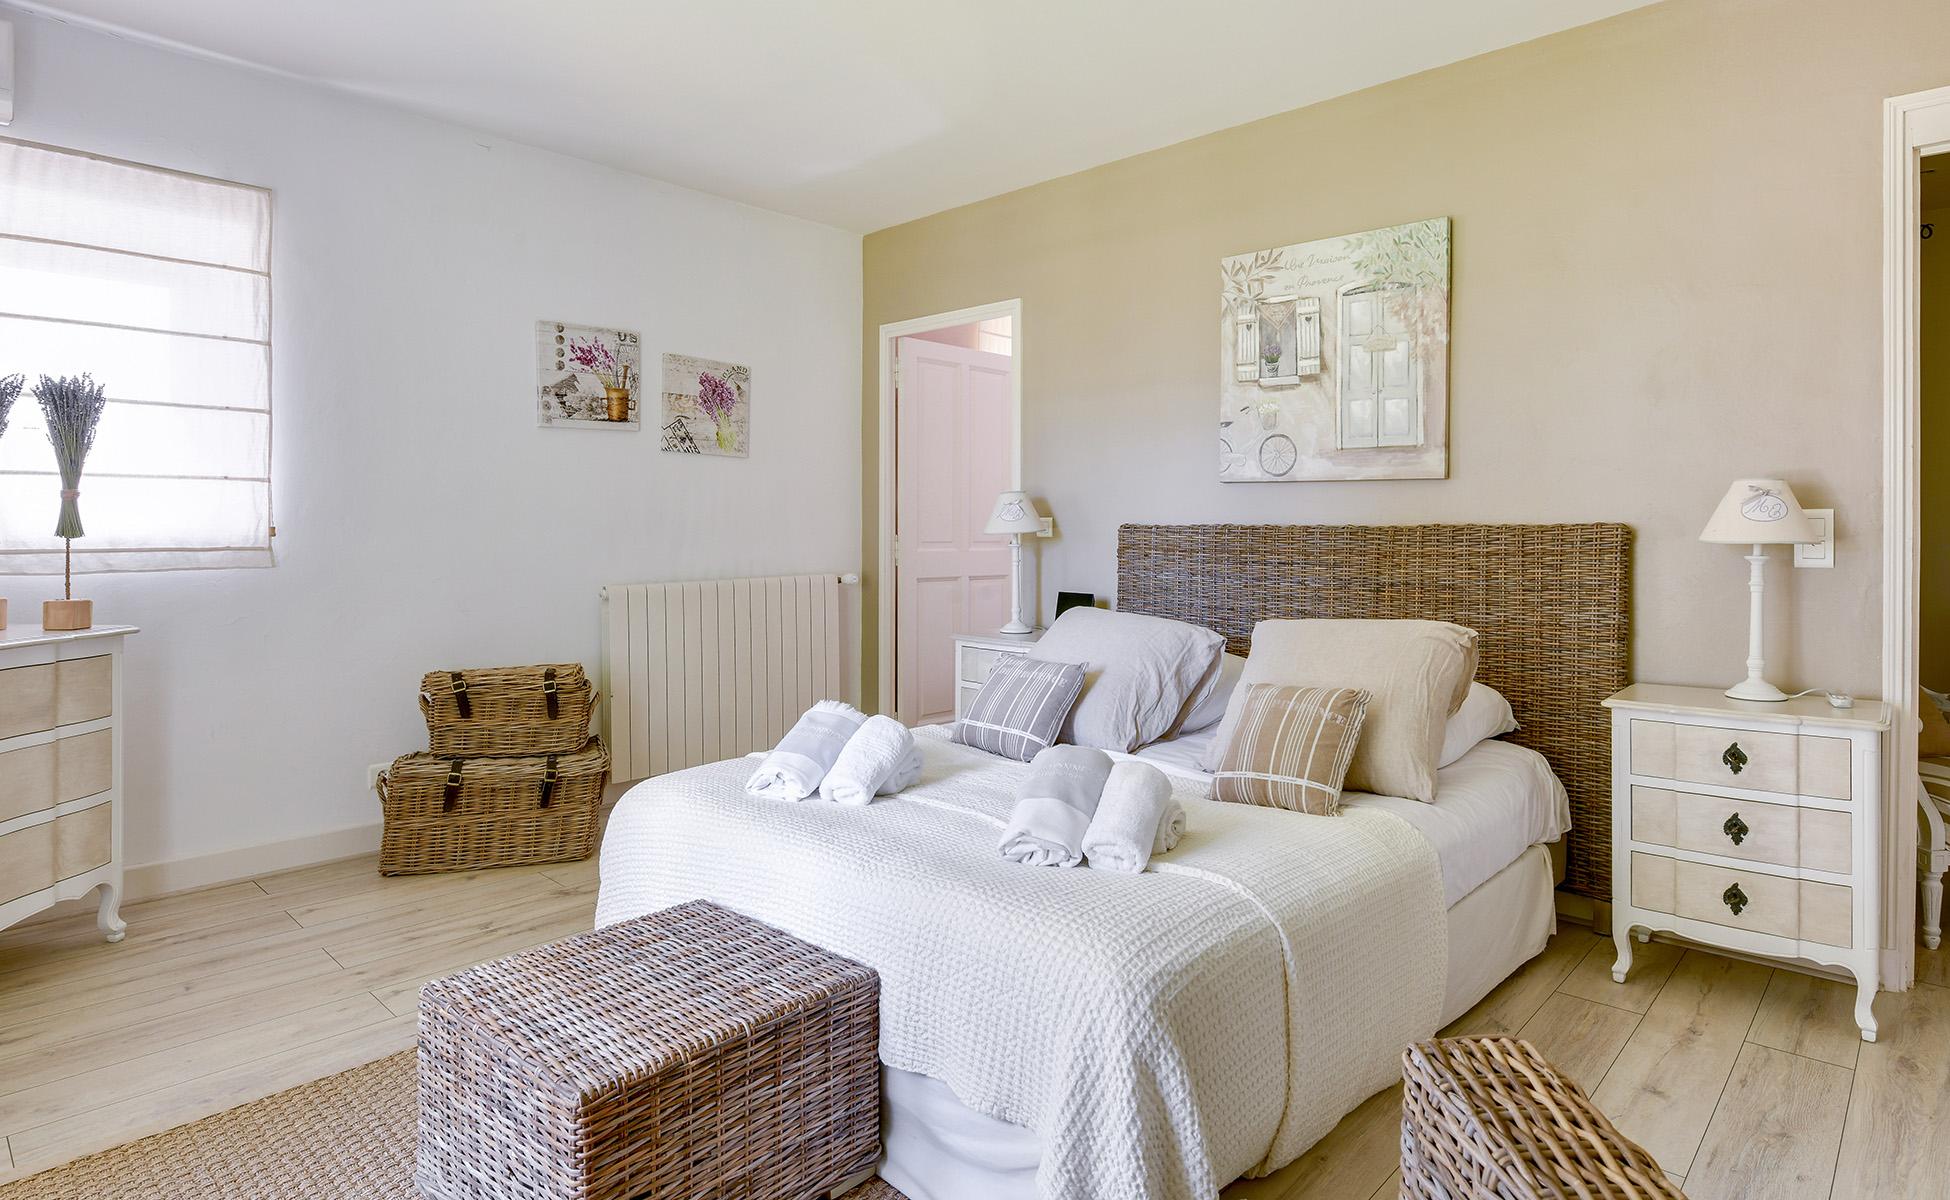 Lovelydays luxury service apartment rental - St Rémy de Provence and surroundings - Ameu Mas - Partner - 6 bedrooms - 6 bathrooms - Queen bed - b6c63cd80cf8 - Lovelydays